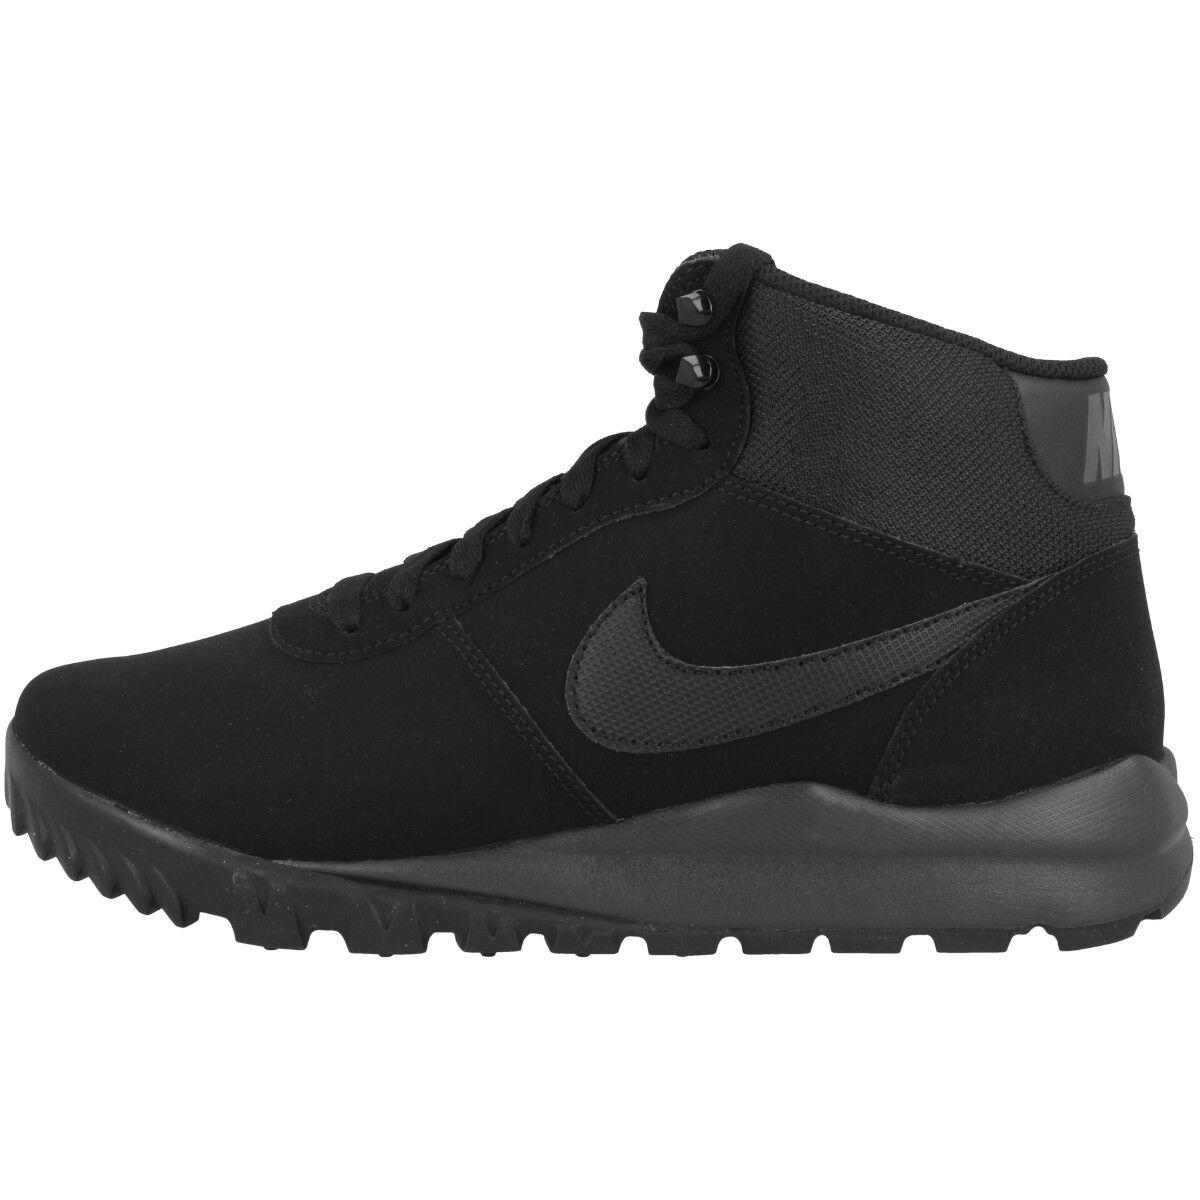 Nike hoodland hoodland hoodland stivali scarpe invernali trekking trekking stivali 654888-090 nero 07006e